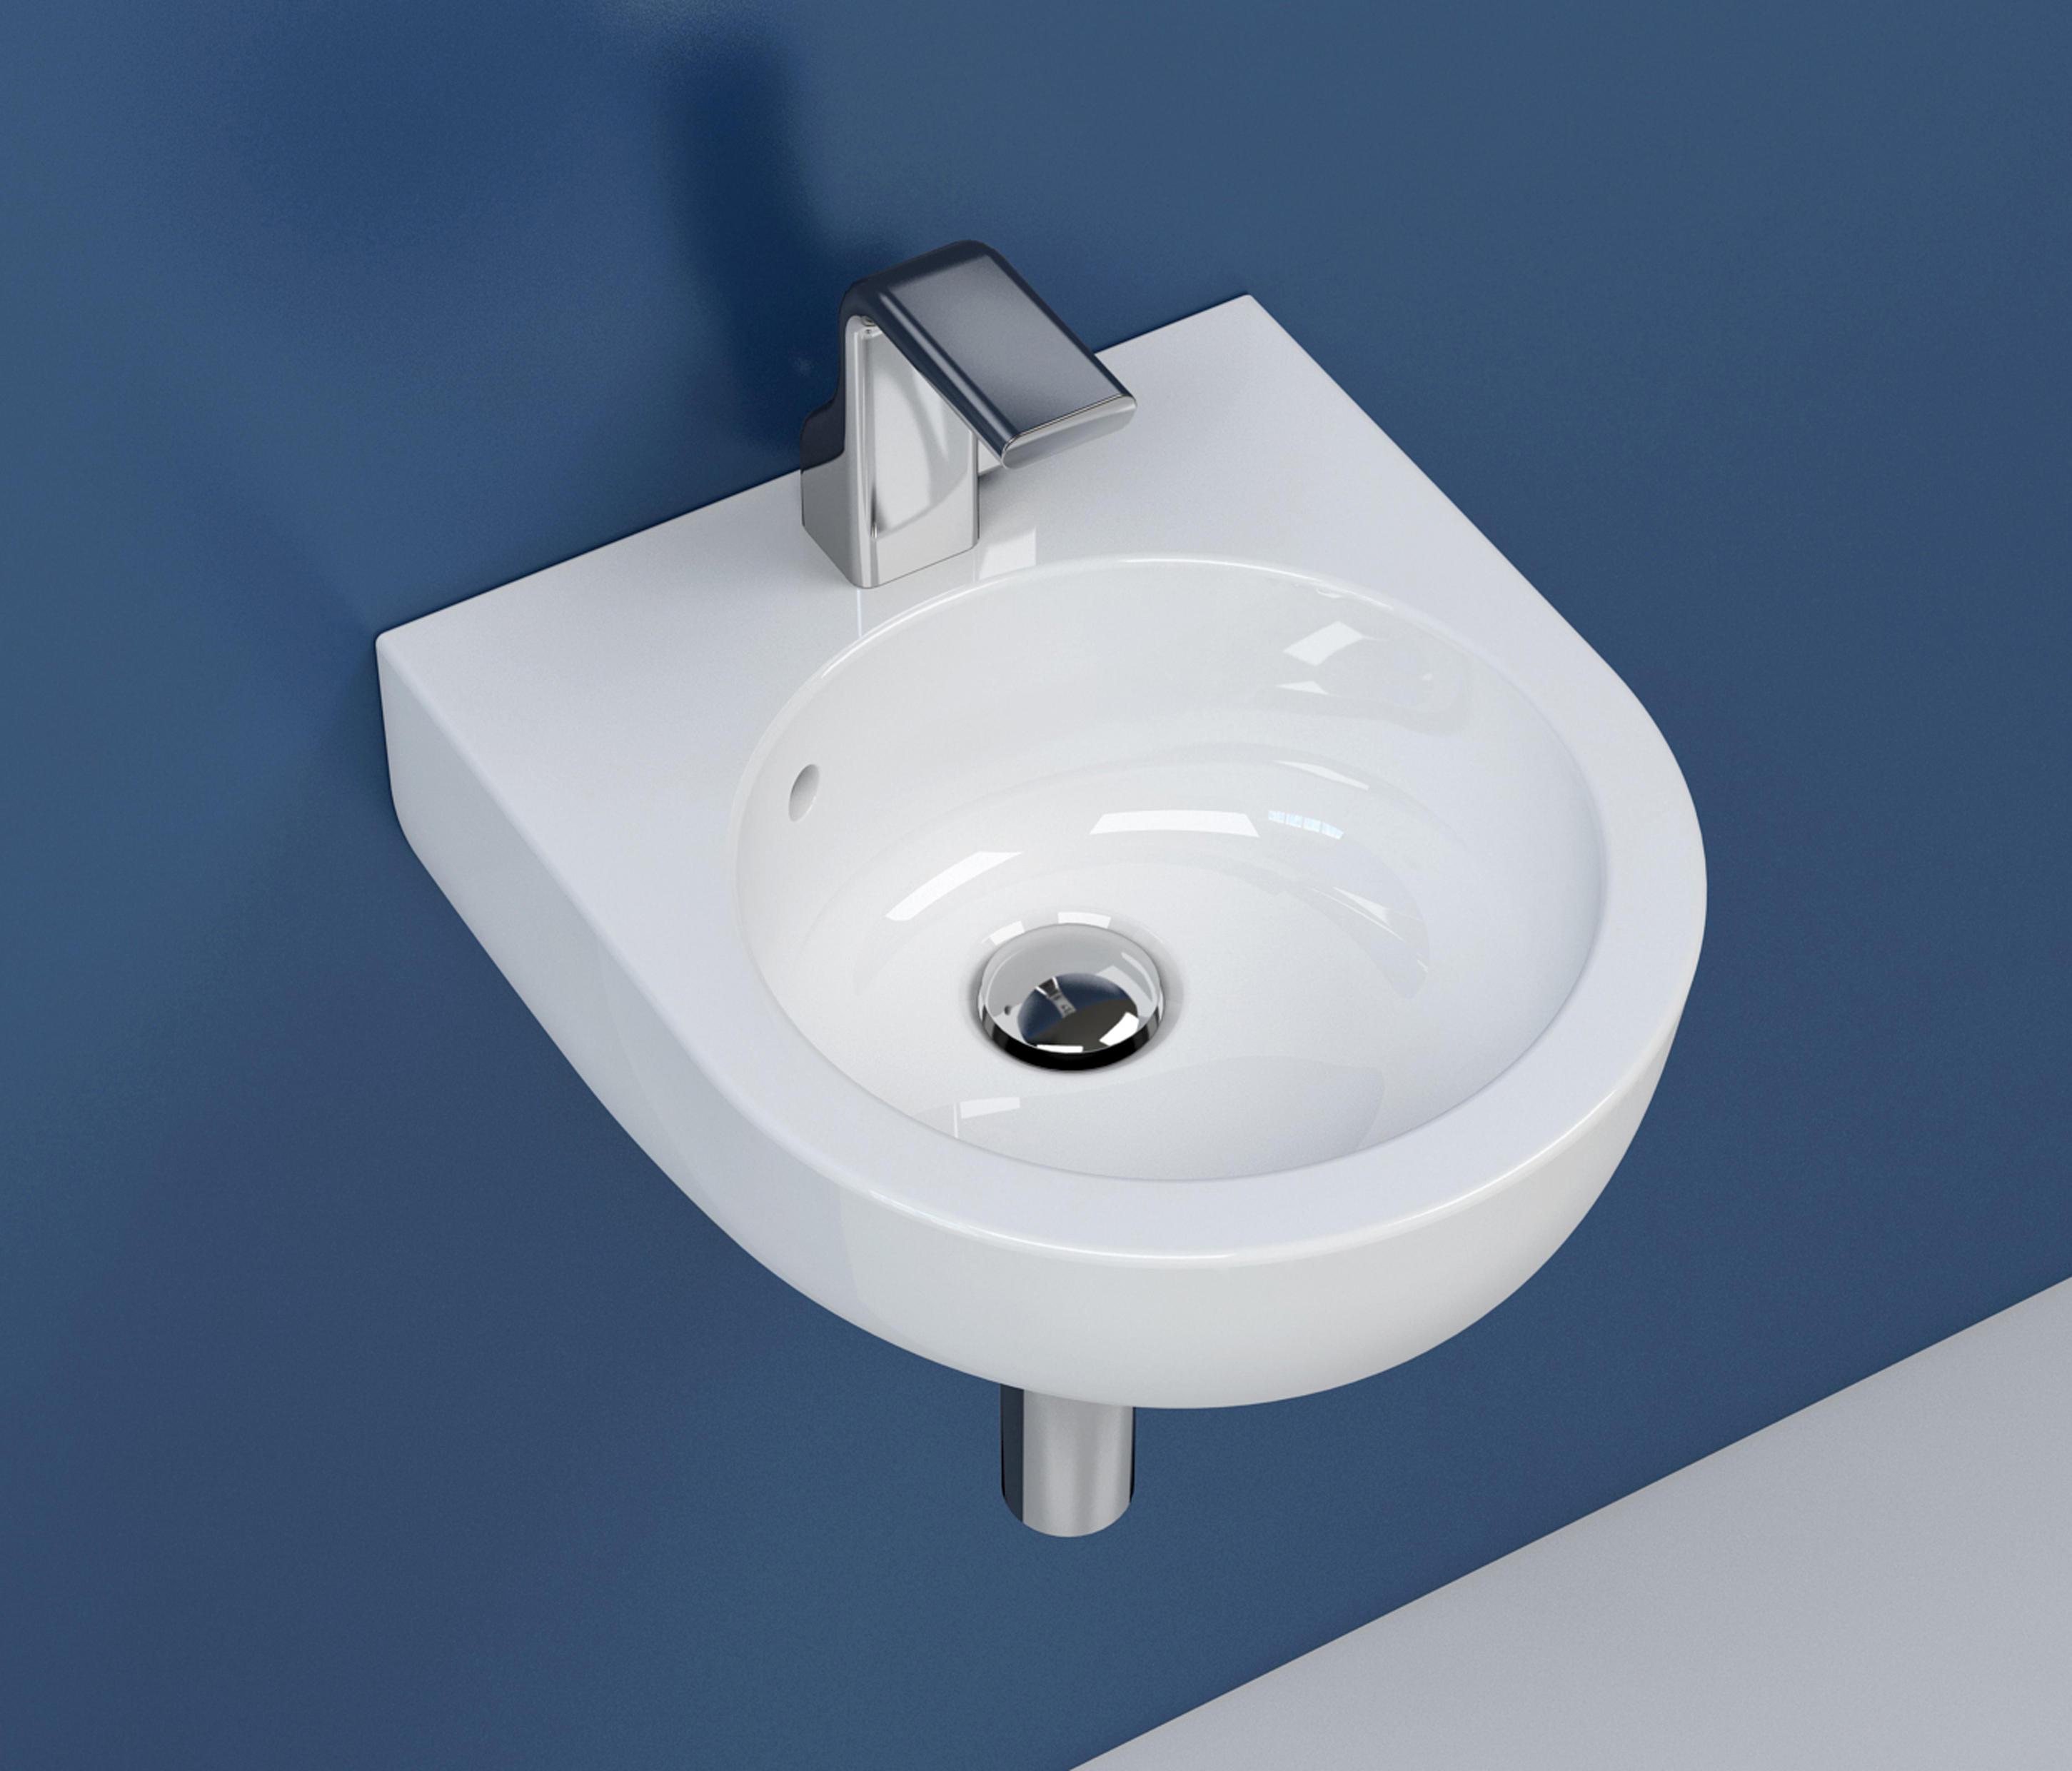 PASS - Wash basins from Ceramica Flaminia | Architonic